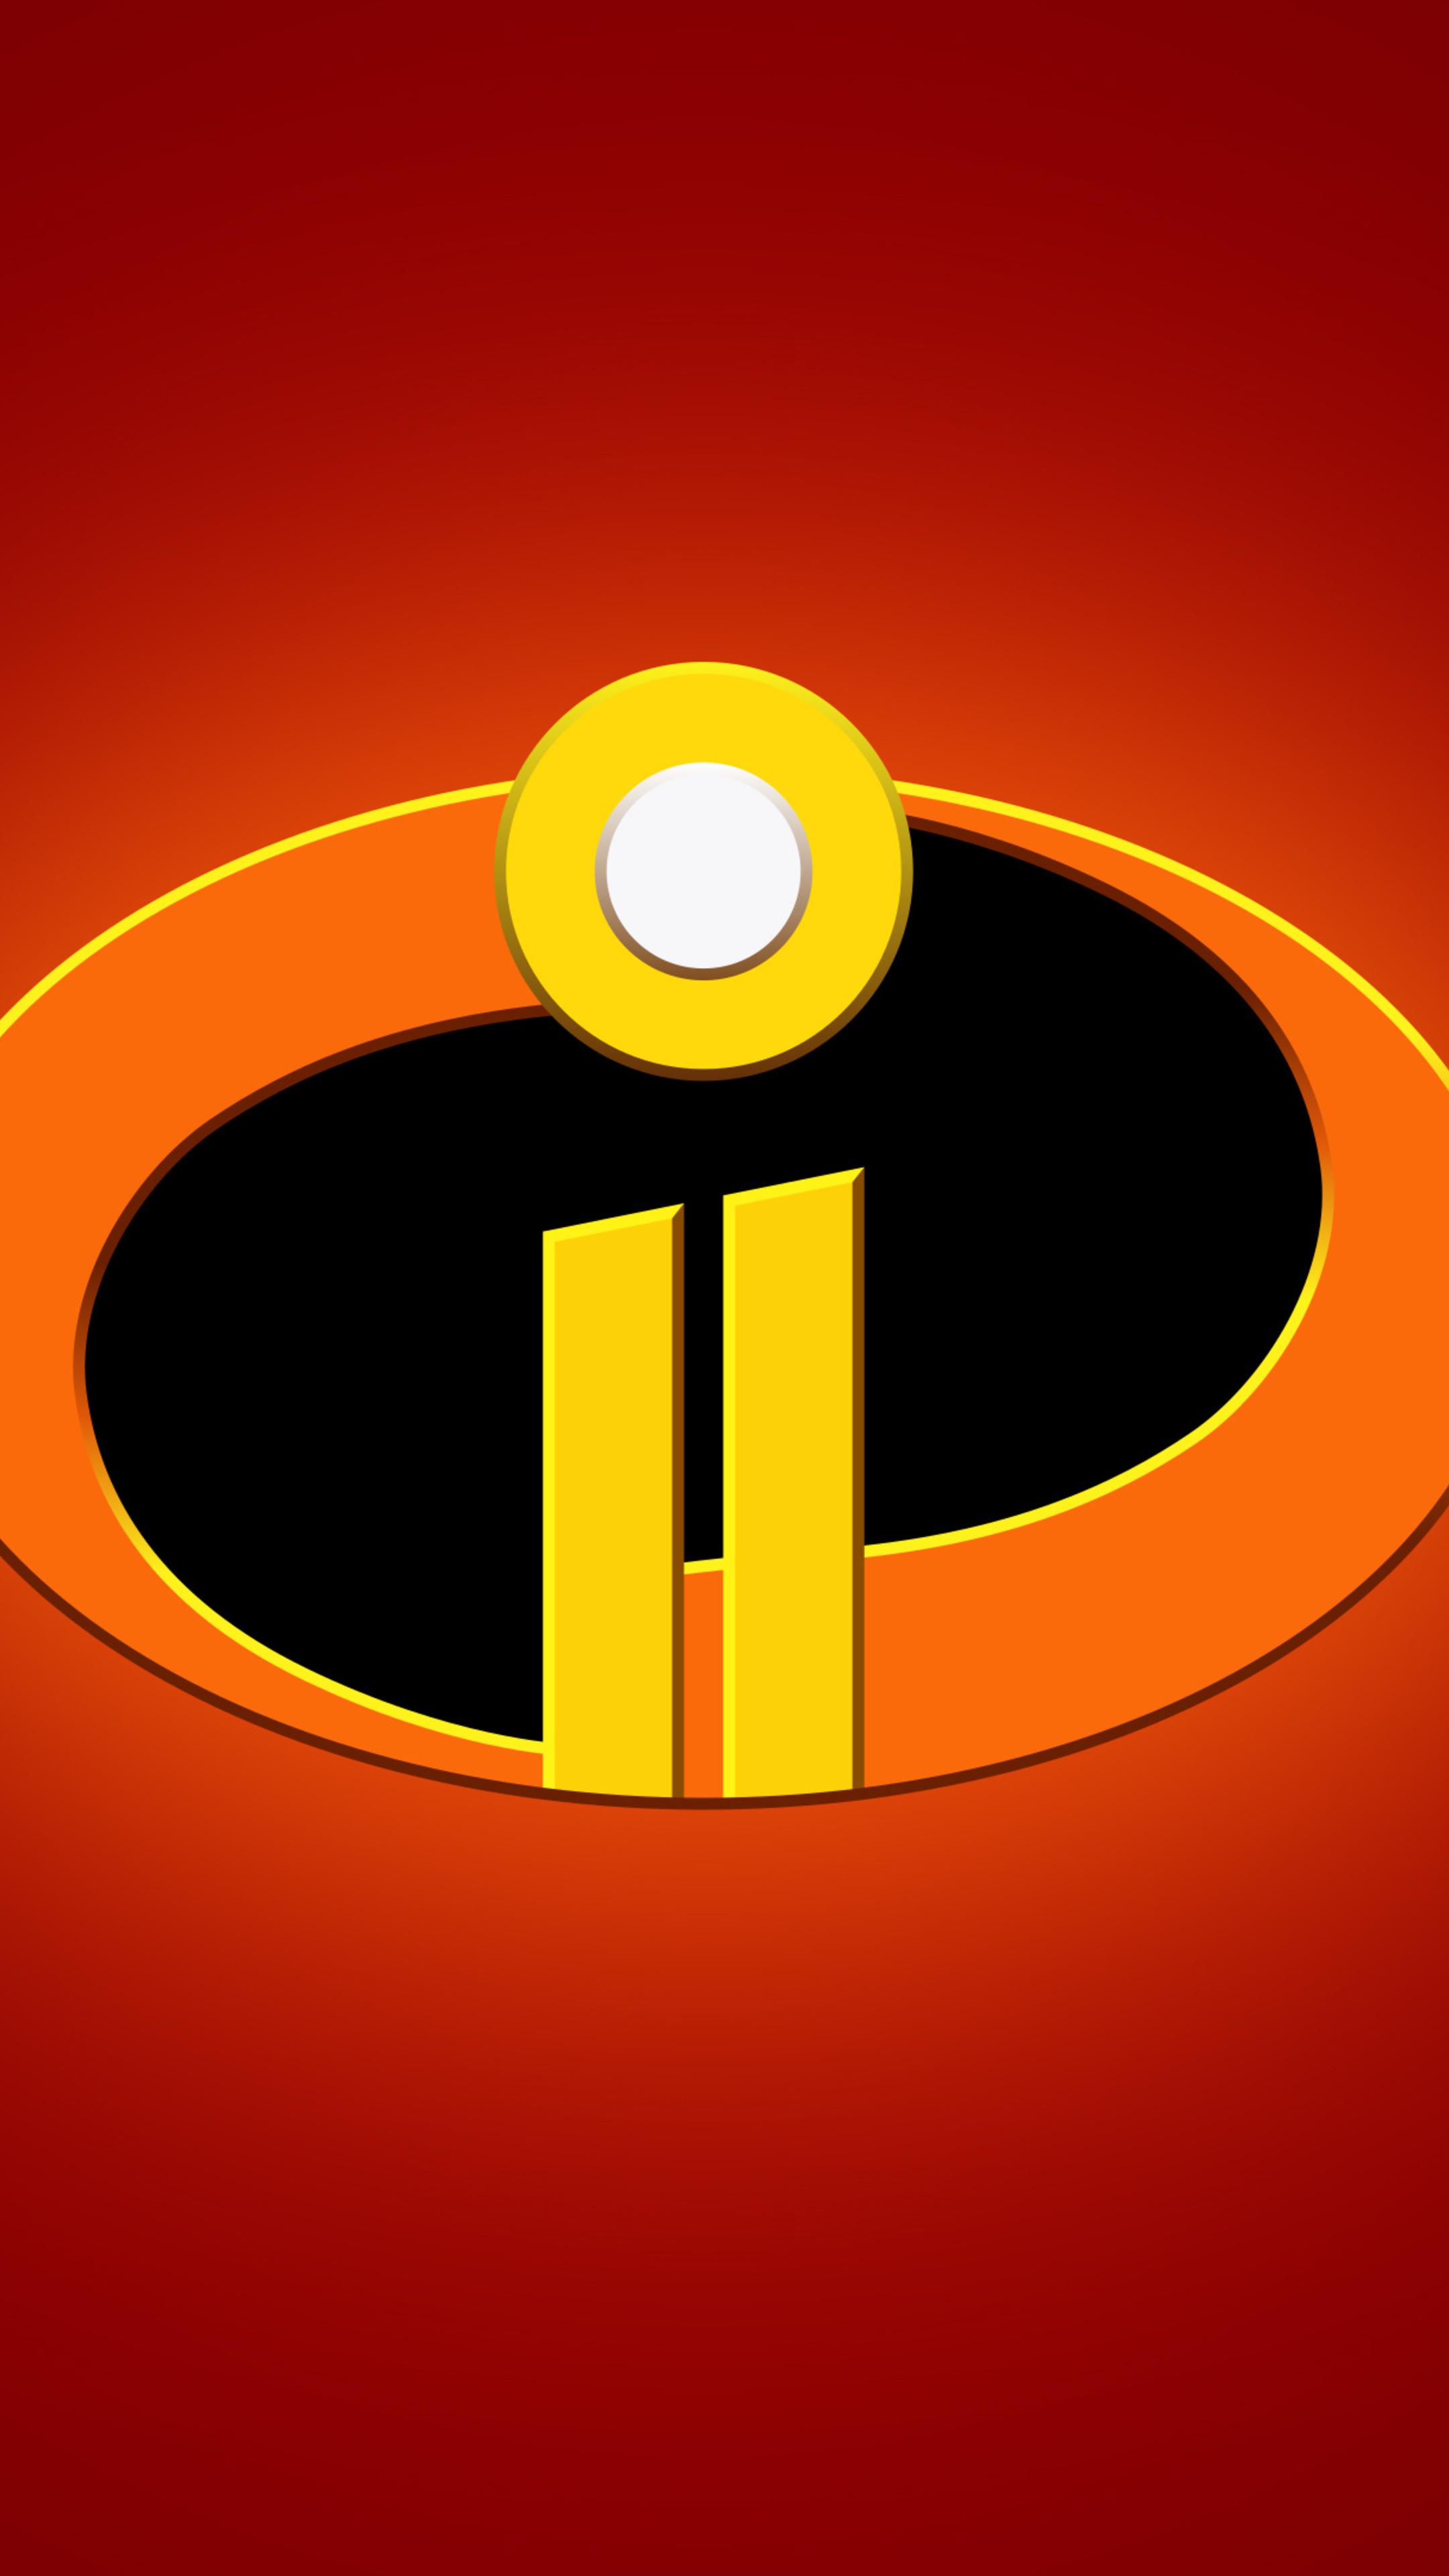 the-incredibles-2-logo-4k-9h.jpg